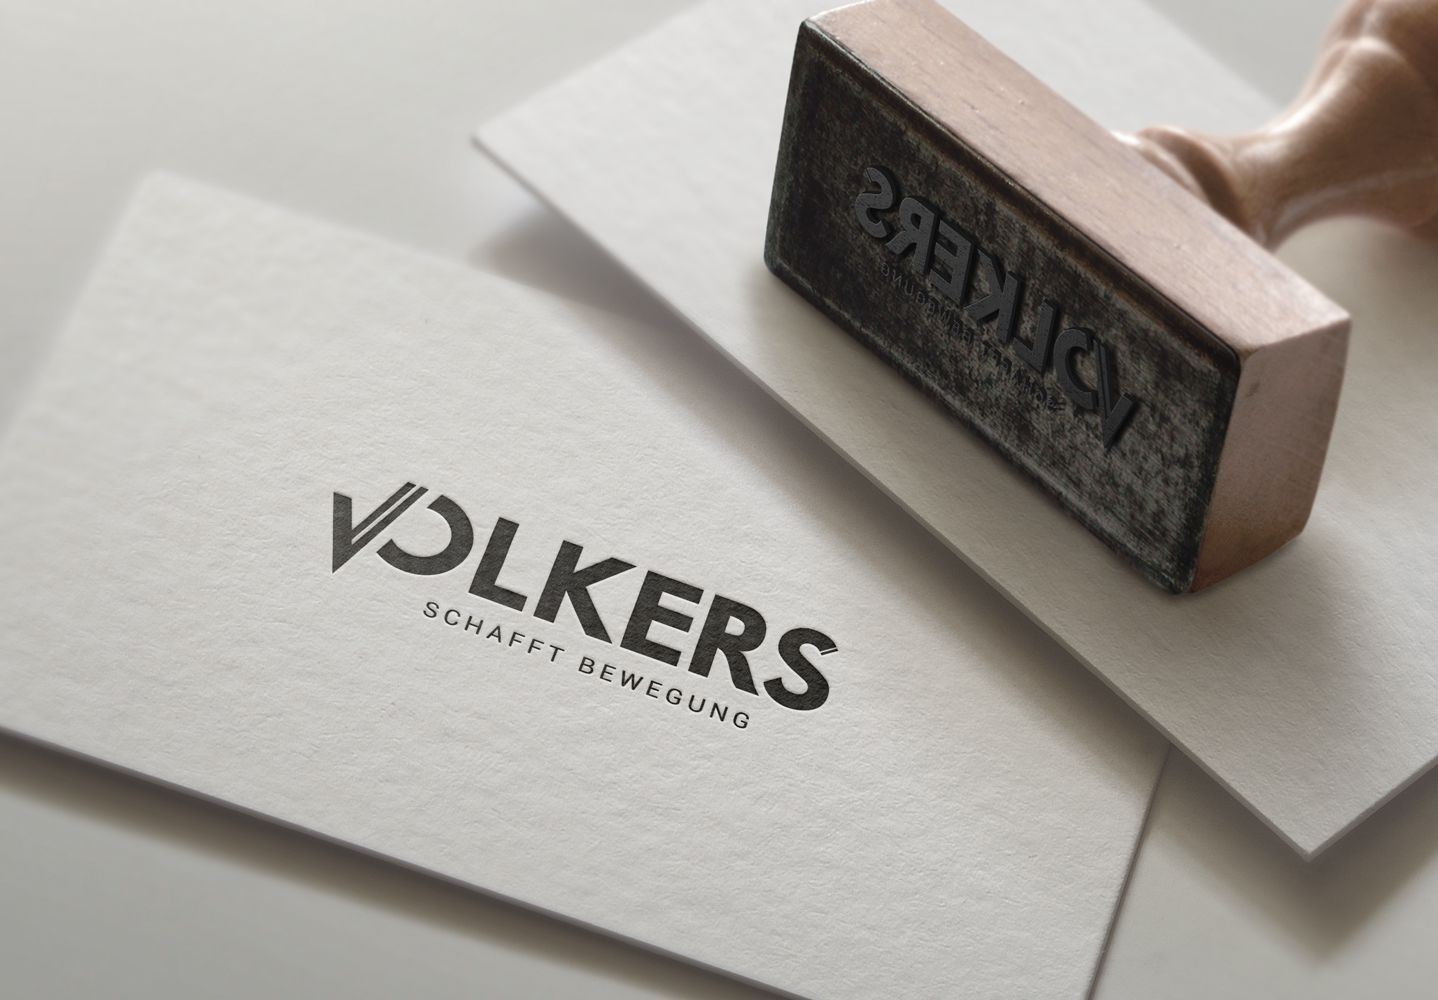 Volkers Fahrschule In Marl Logo Update Designed By